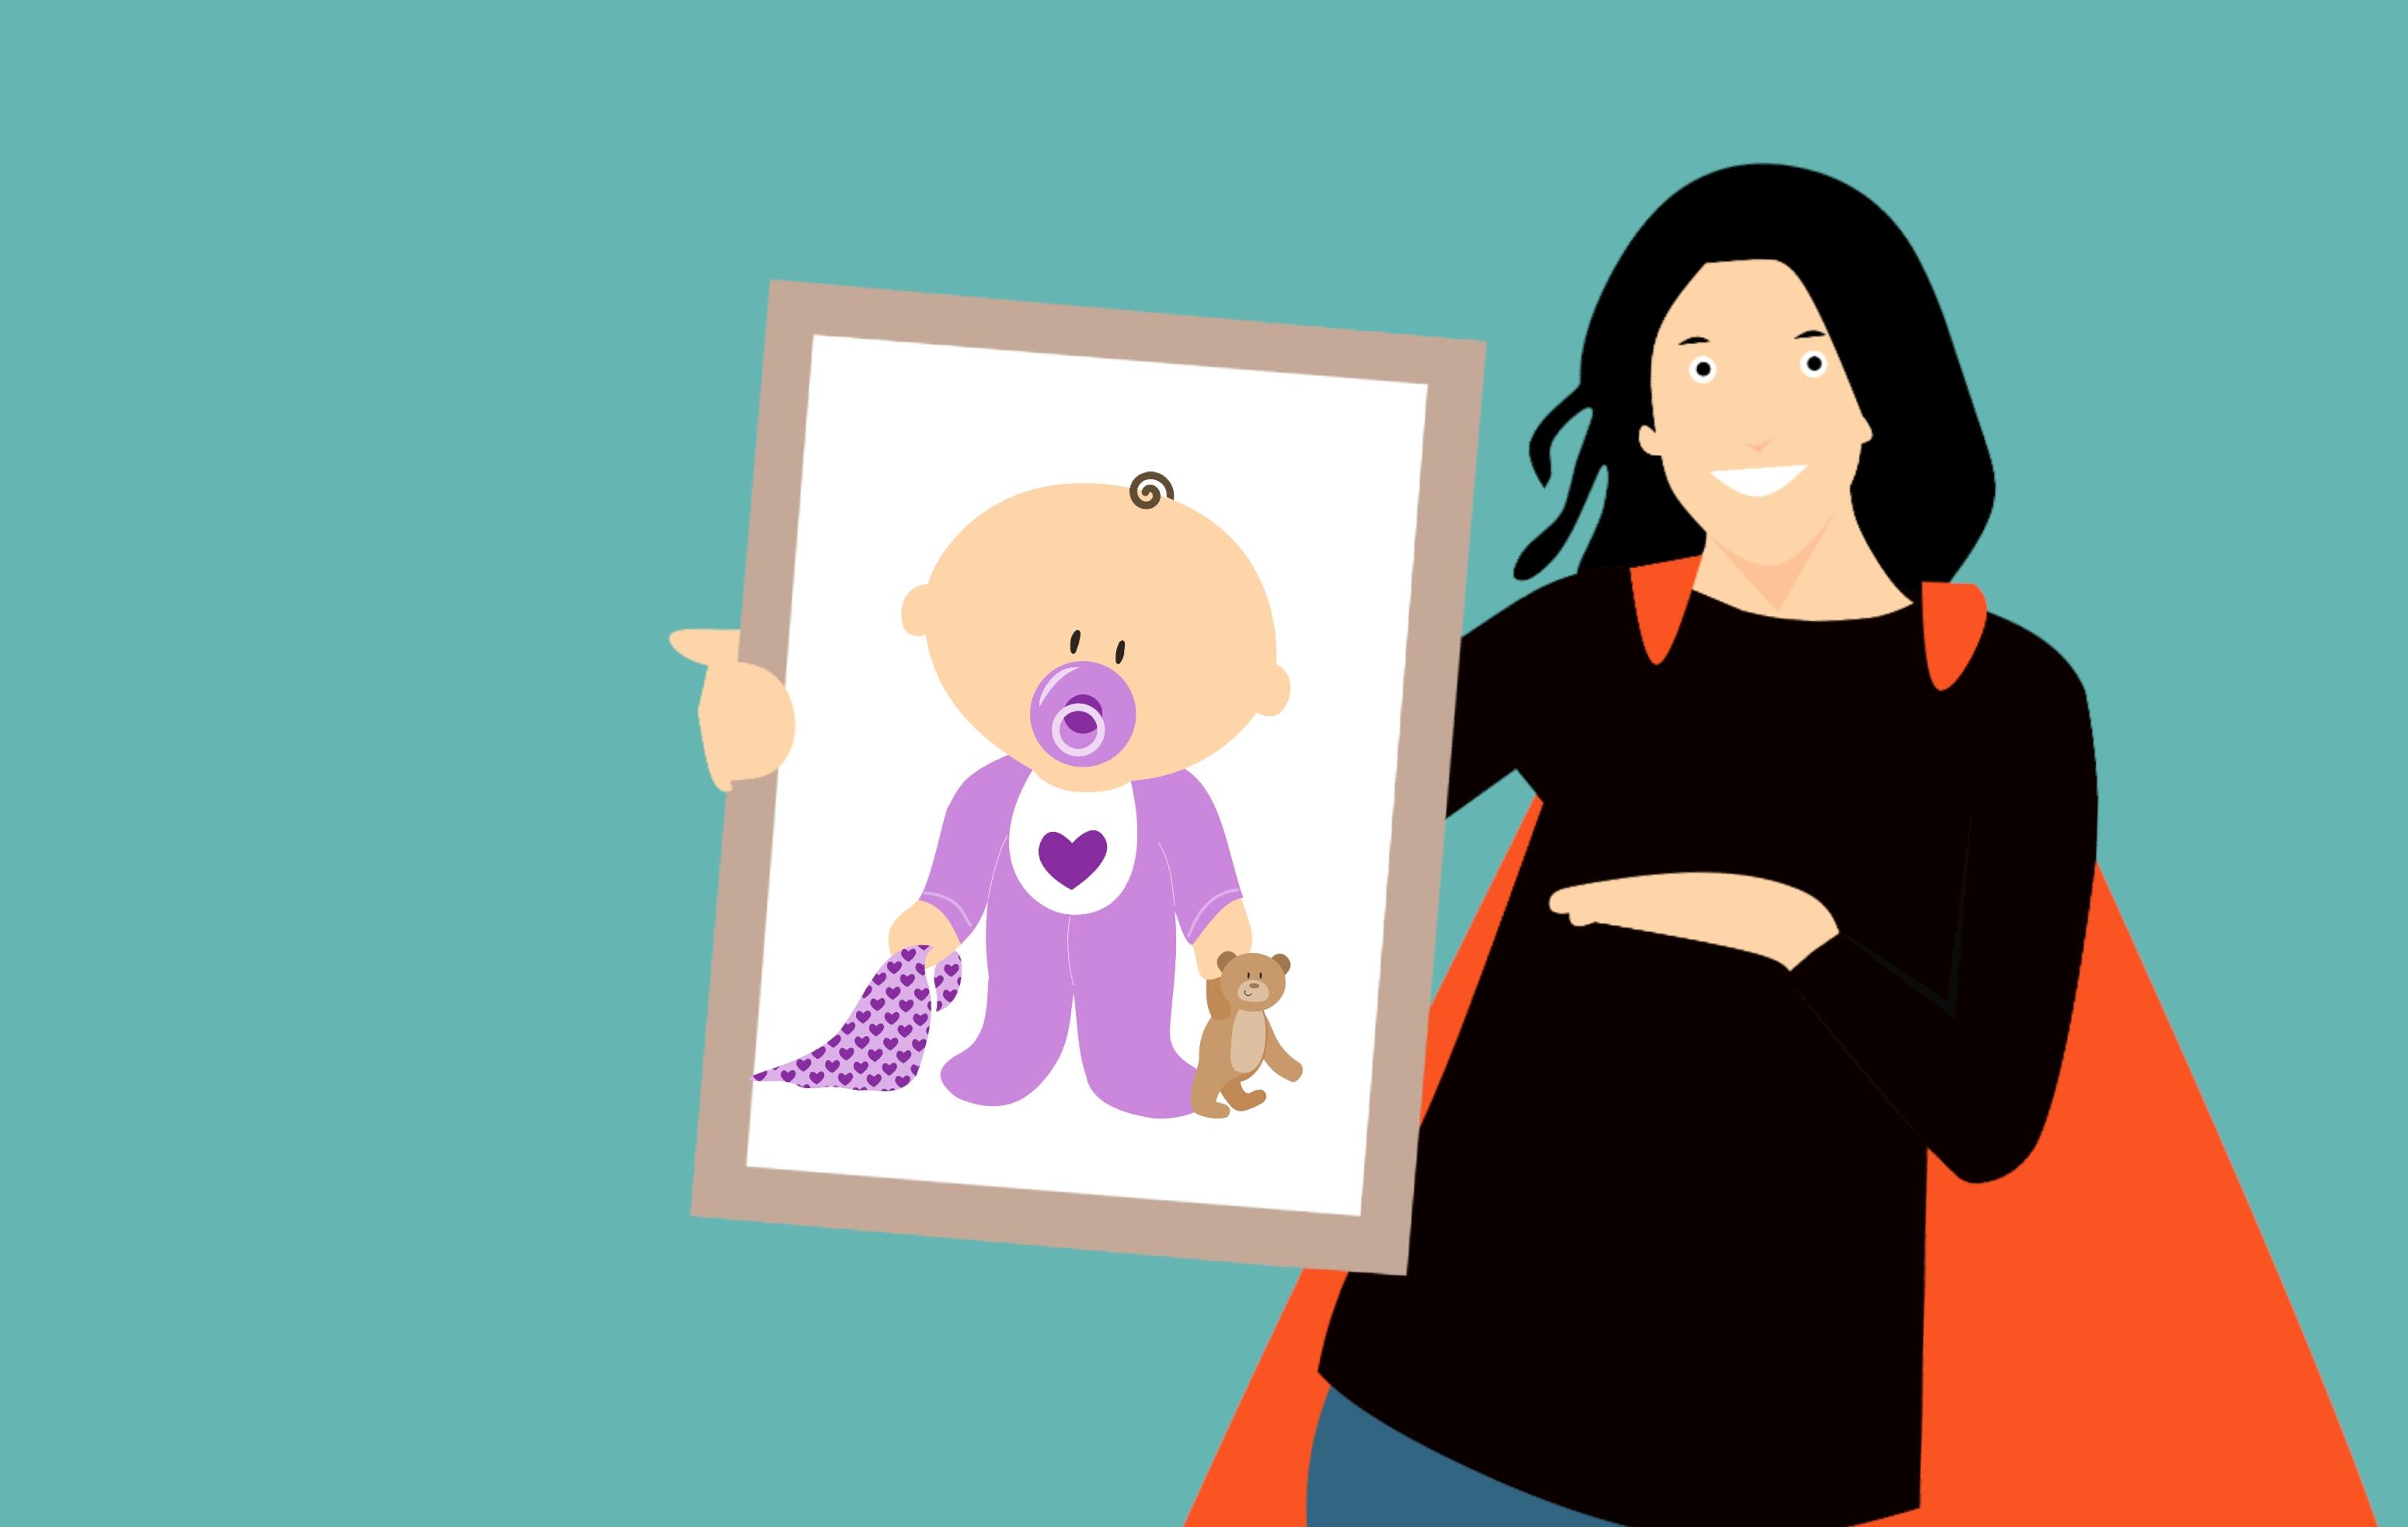 Gambar Mama Super Ibu Pahlawan Anak Keluarga Super